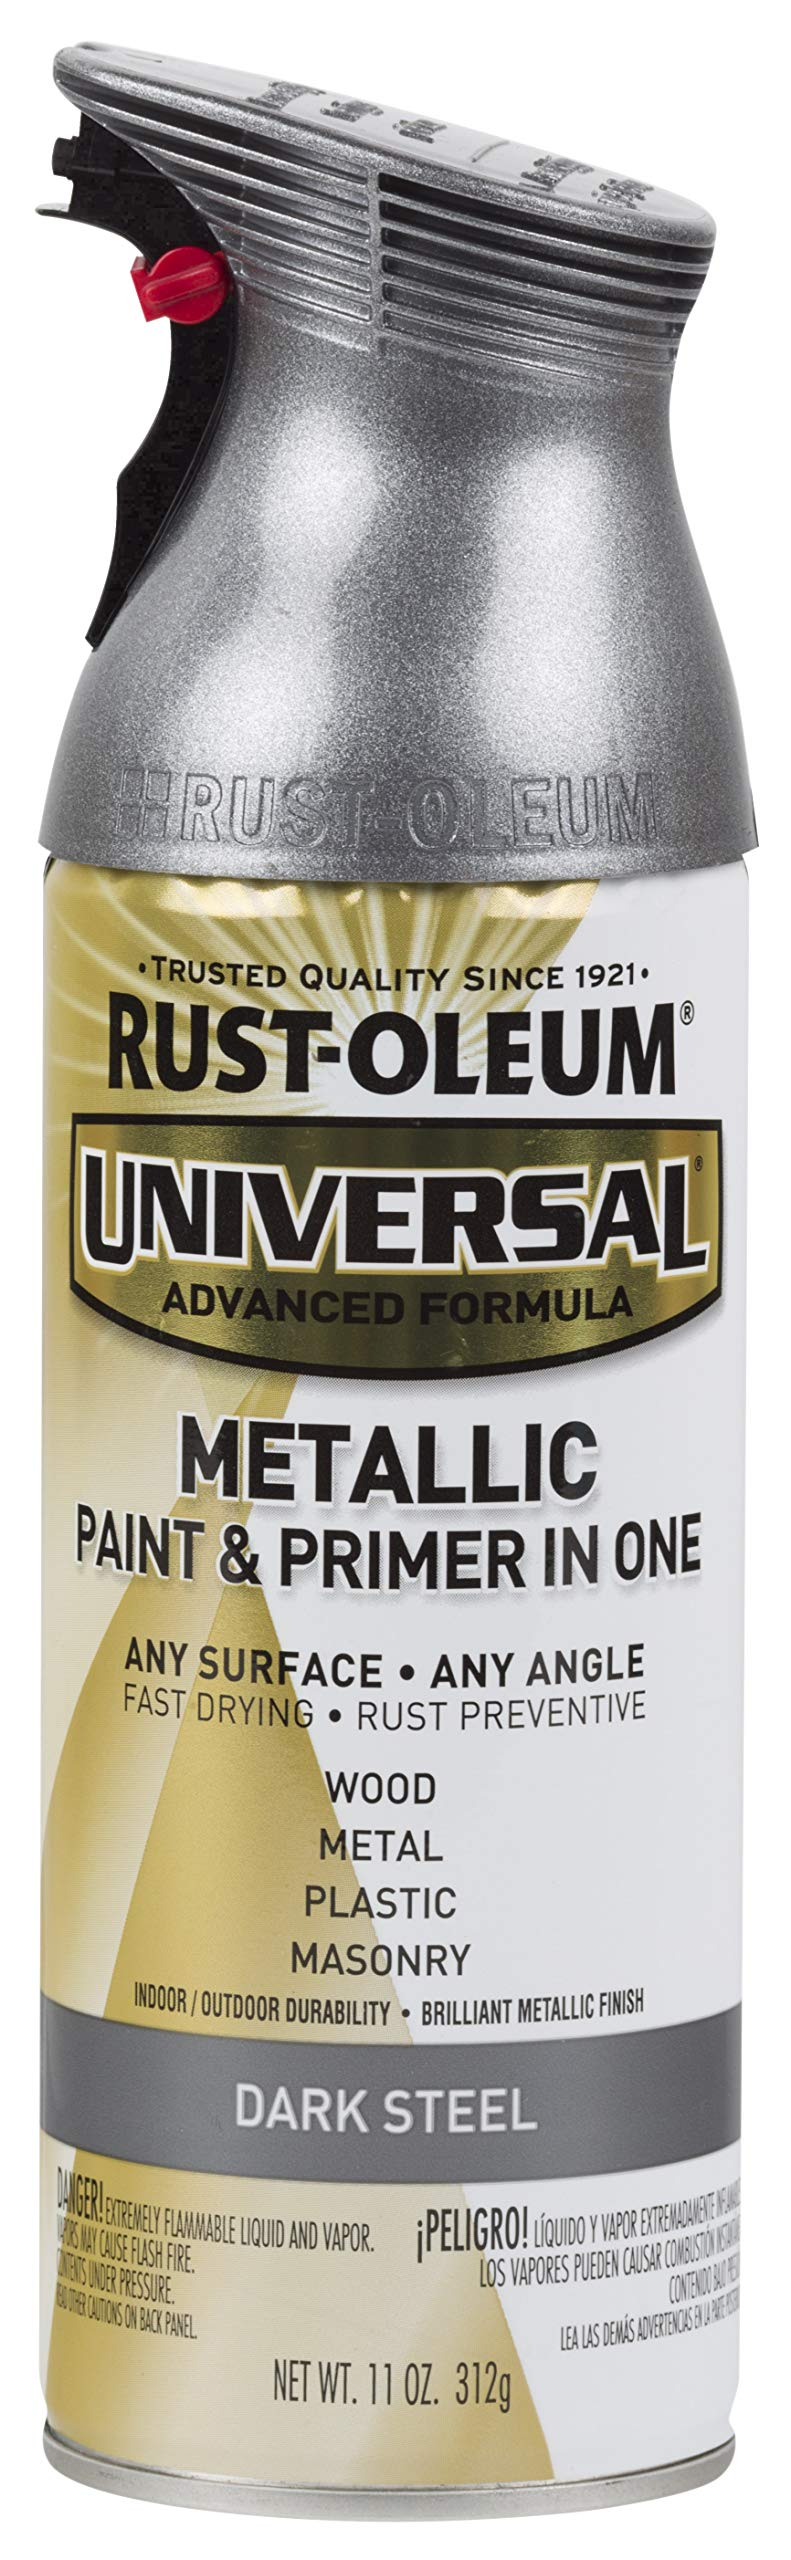 Rust-Oleum, Metallic Dark Steel 262662 Universal All Surface Spray Paint, 11 oz